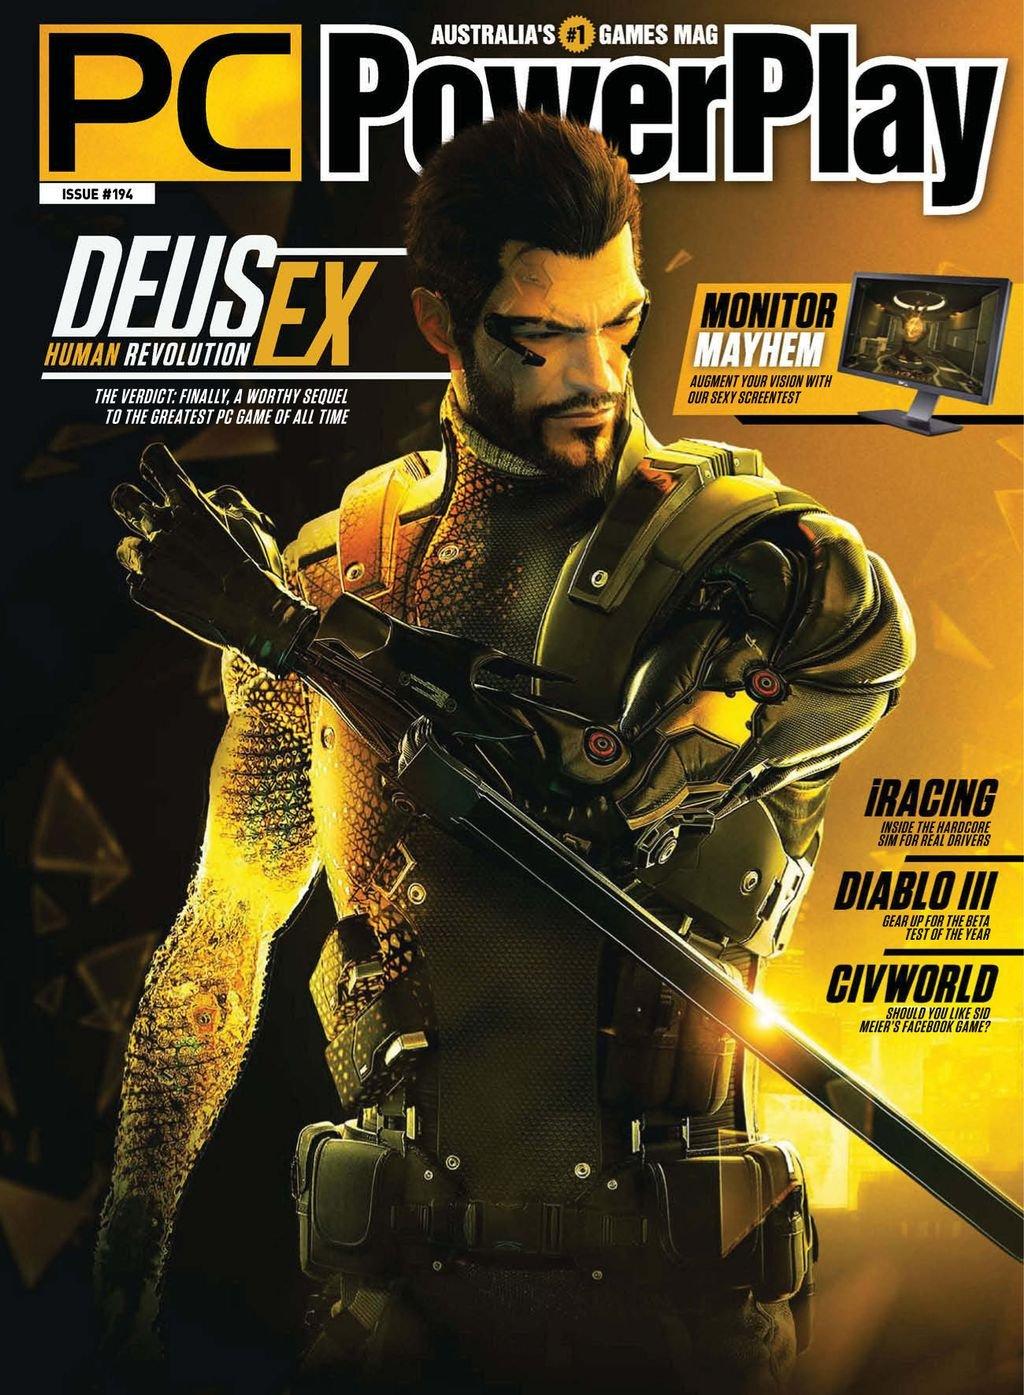 PC PowerPlay 195 (October 2011)